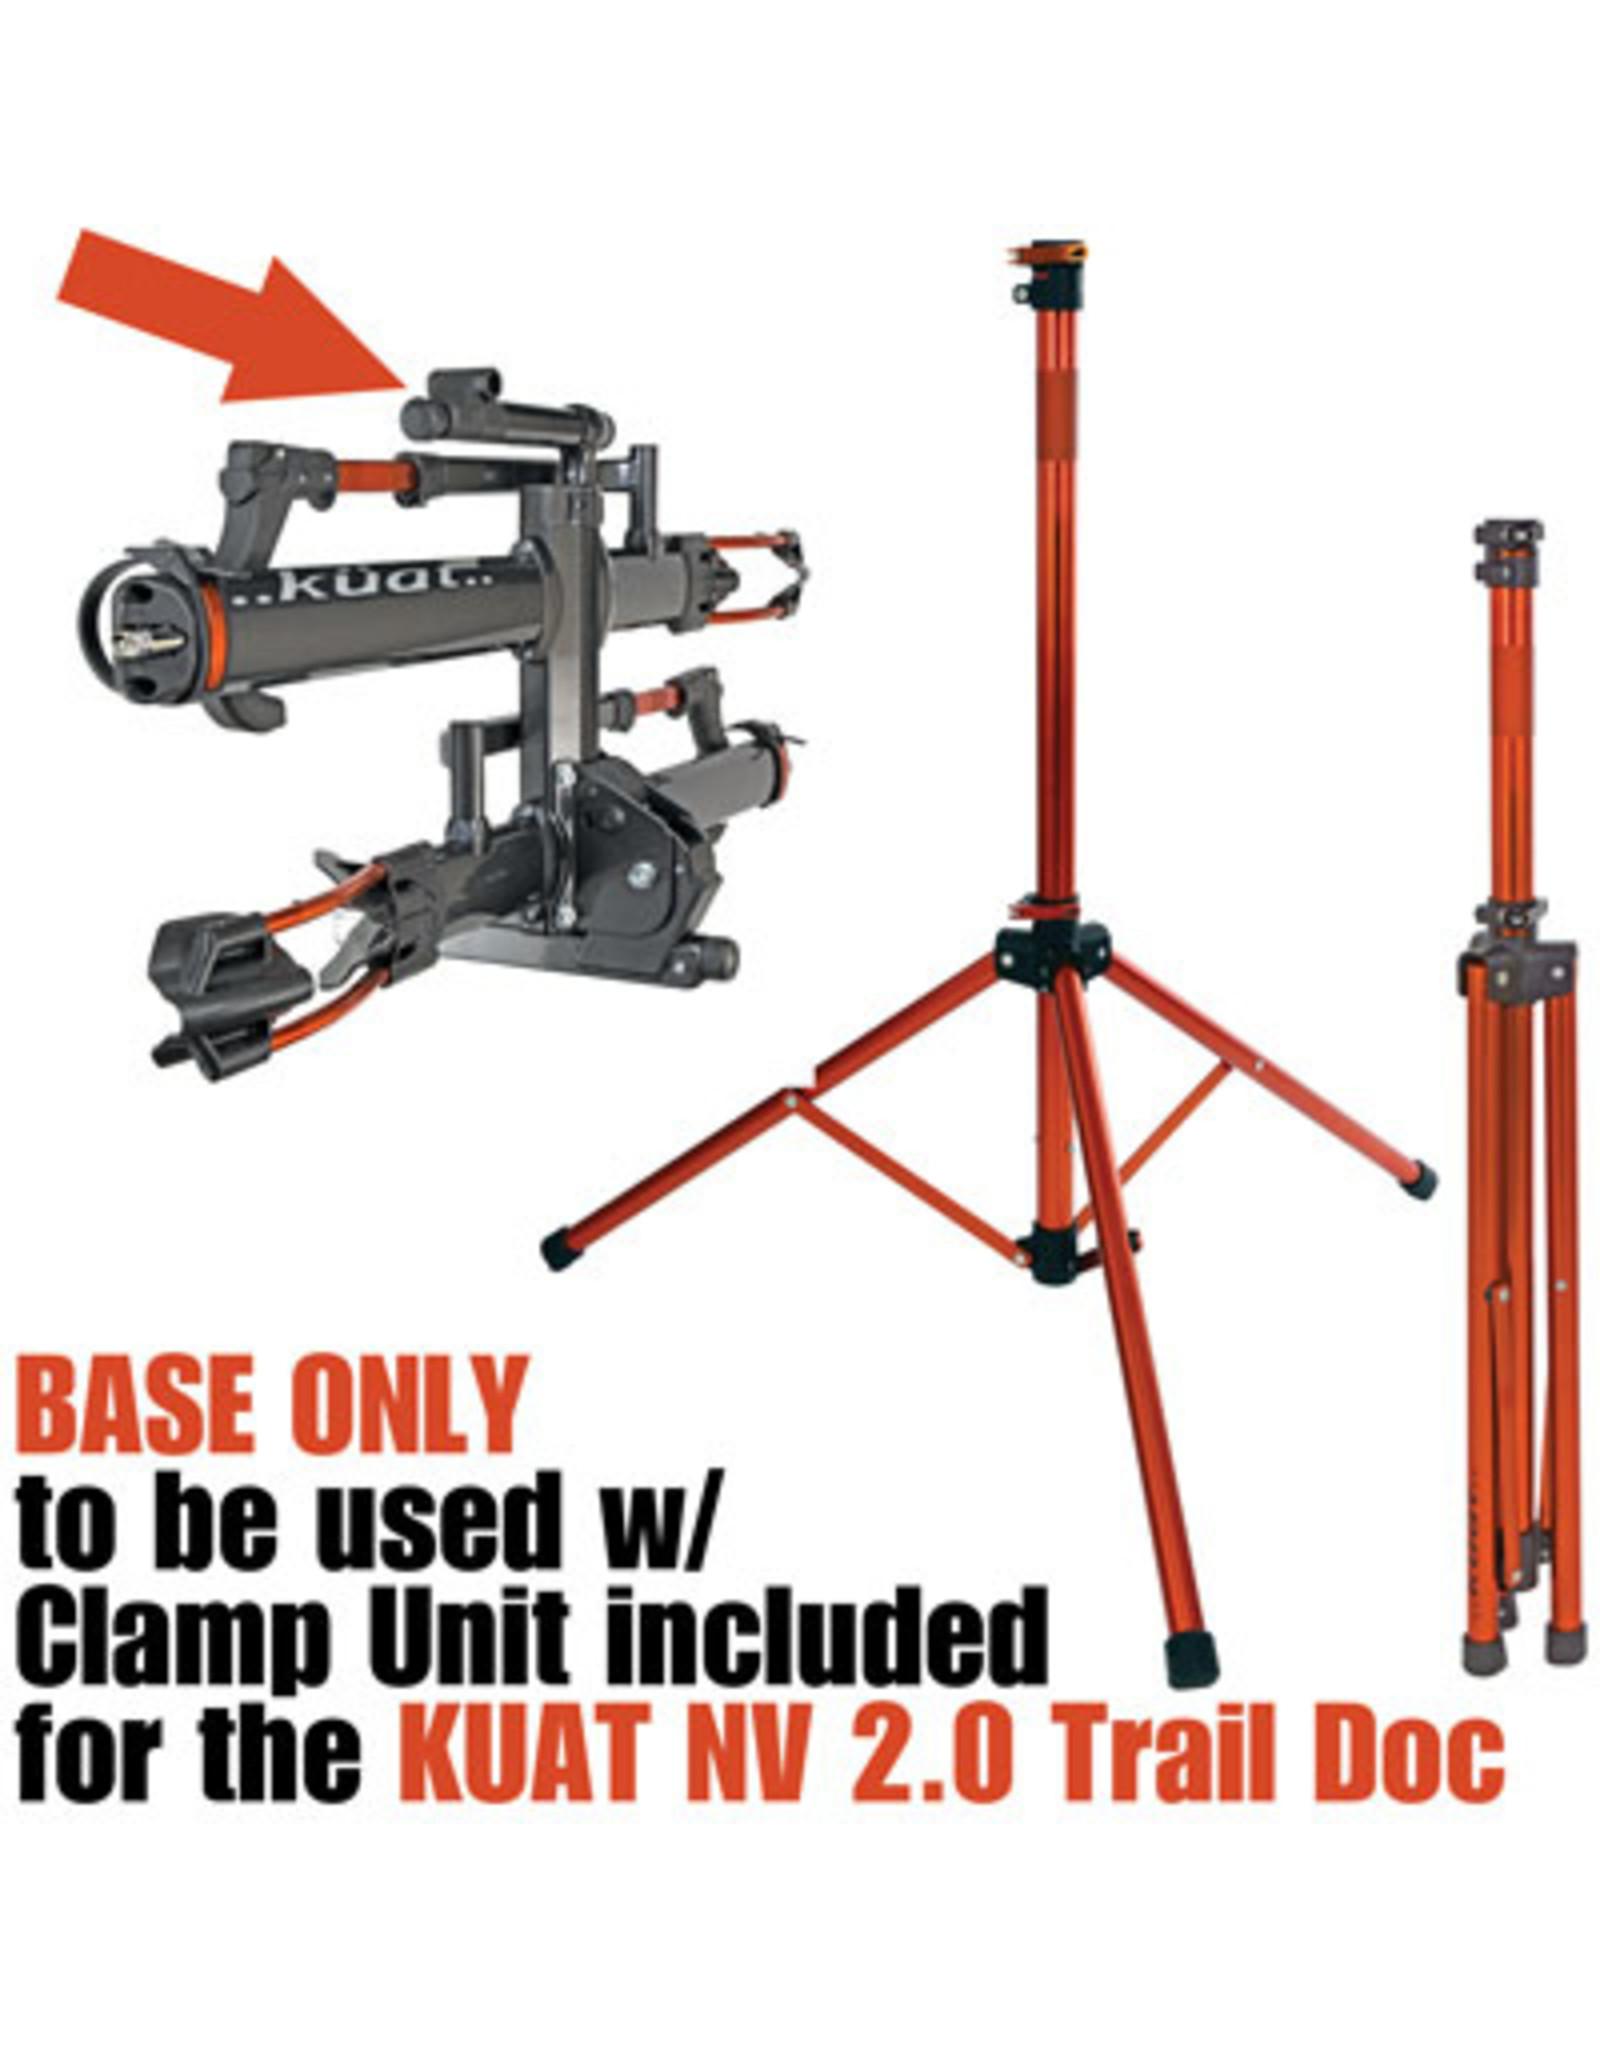 Kuat Kuat Tri Doc - Trail Doc Stand